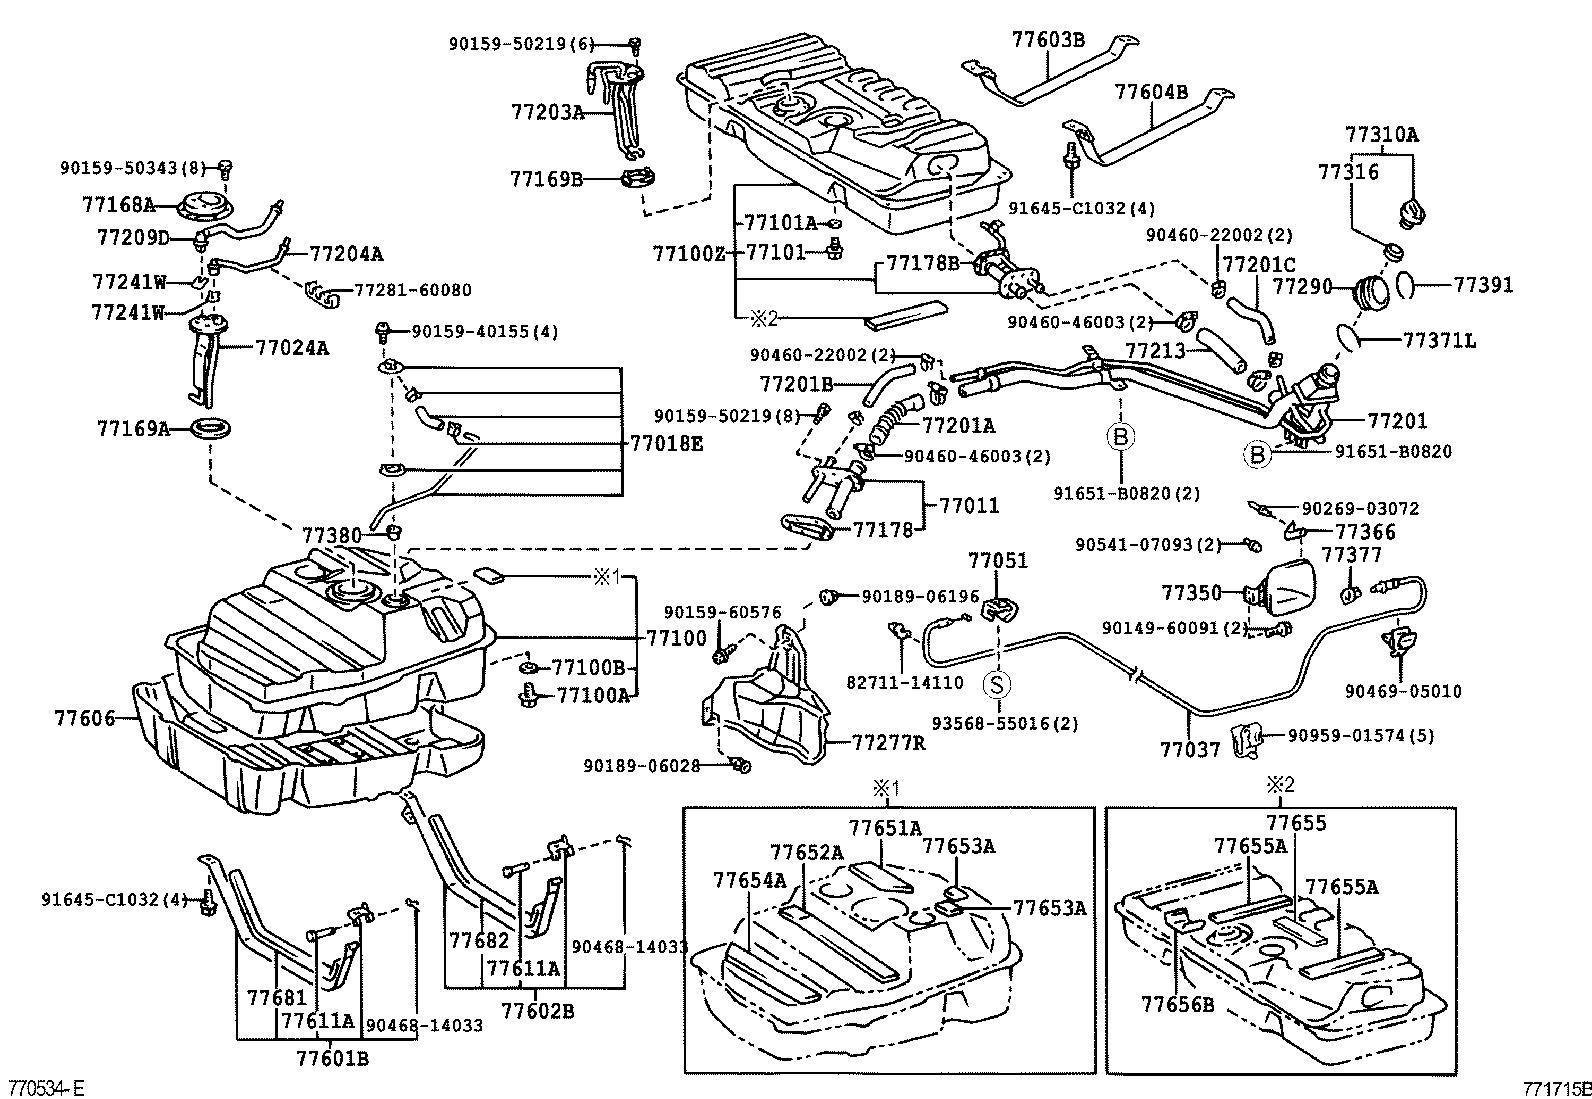 Lexus Lx470 Parts Diagram Wiring Diagram Left Ignition A Left Ignition A Networkantidiscriminazione It